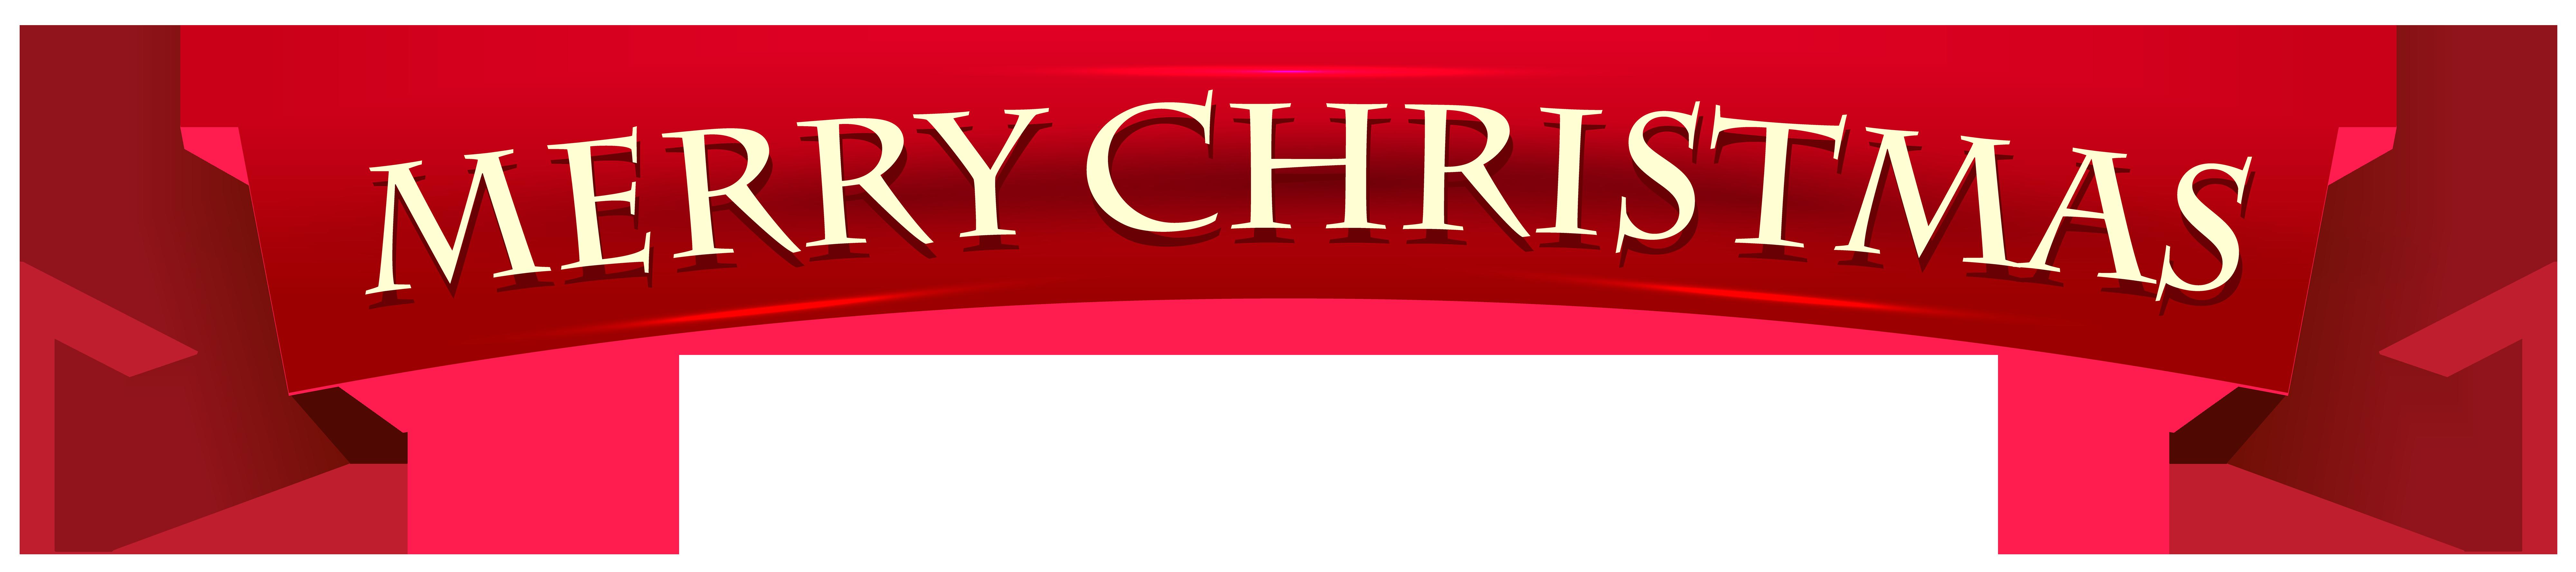 Merry Christmas Banner Banner Merry Christmas Transparent Clip Art Image